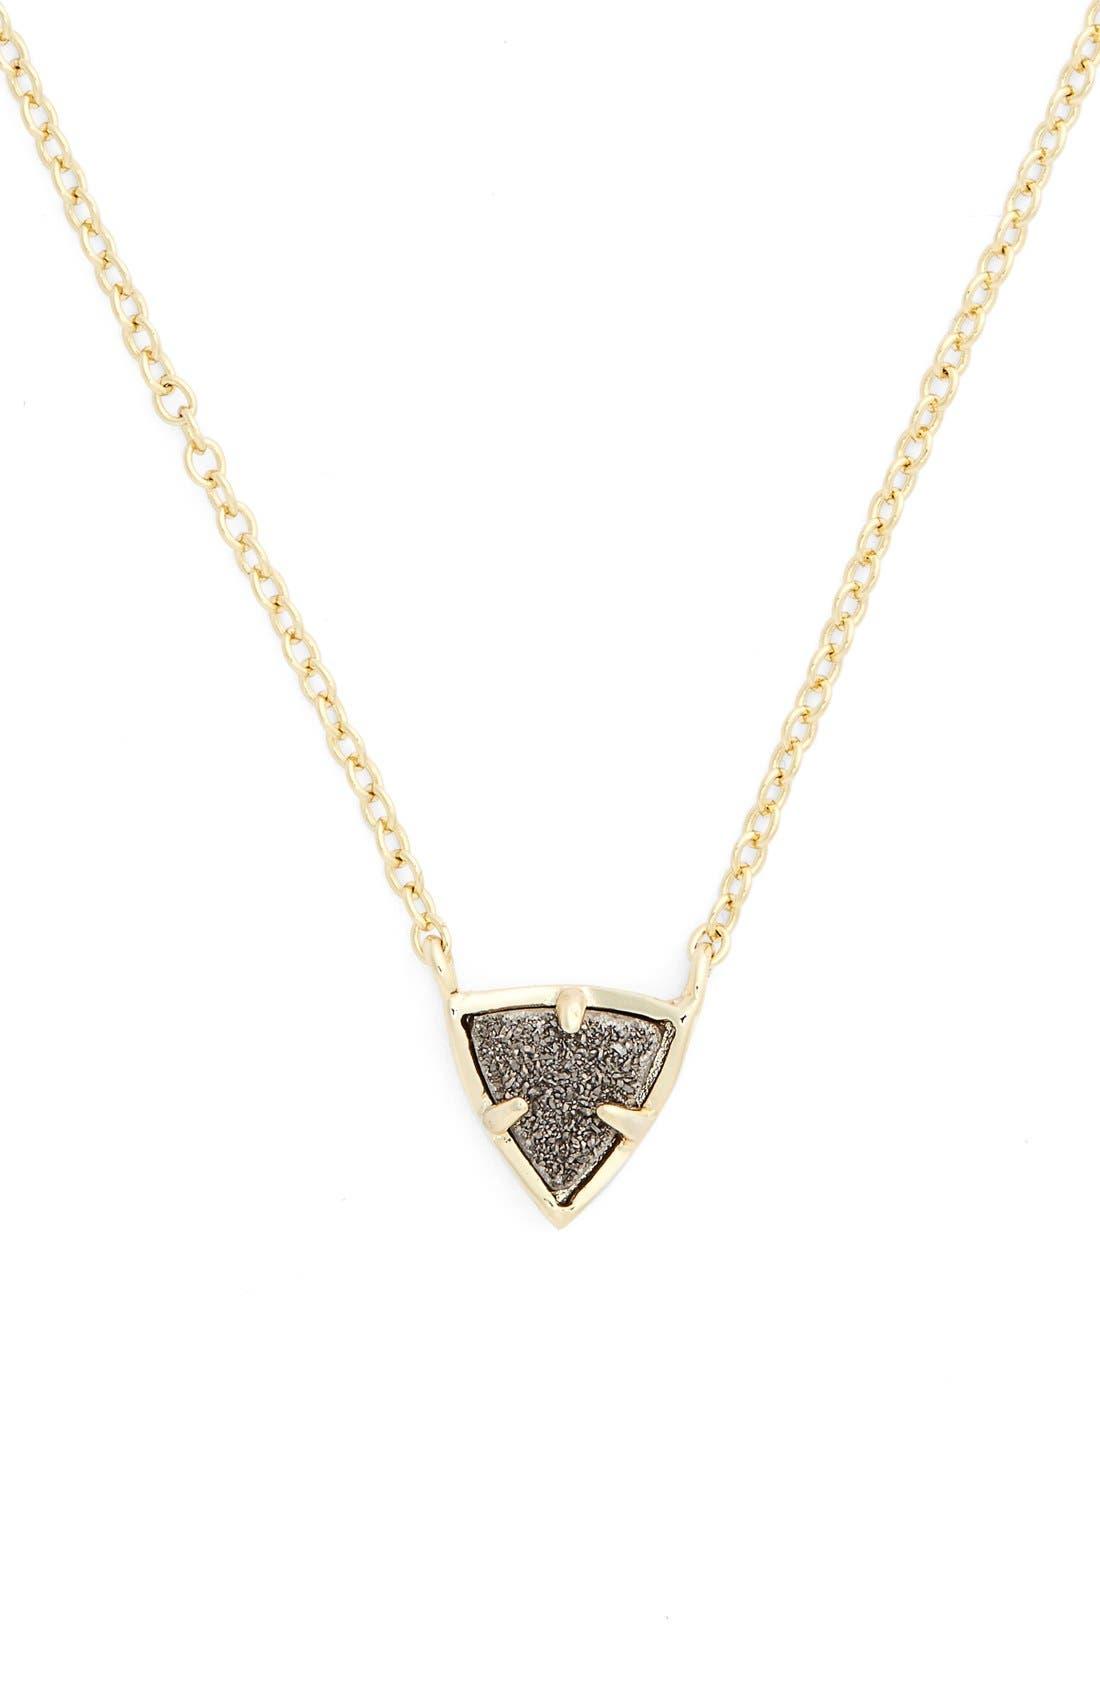 Main Image - Kendra Scott 'Perry' Stone Pendant Necklace